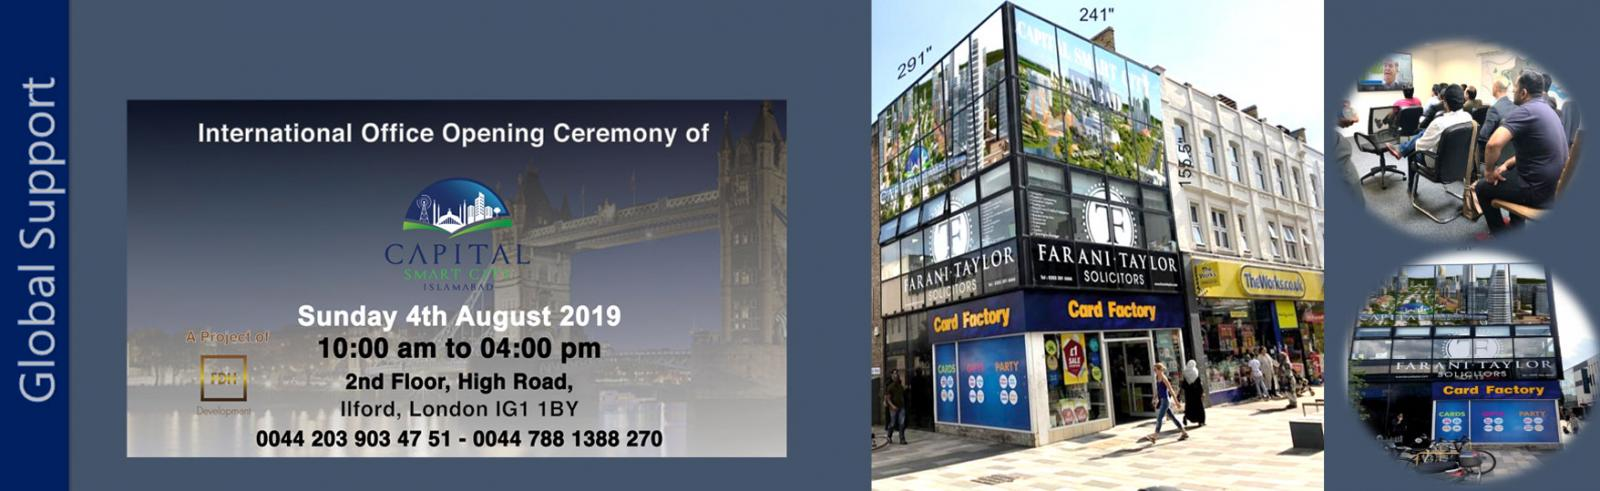 International Office Opening Ceremony (Ilford, London)